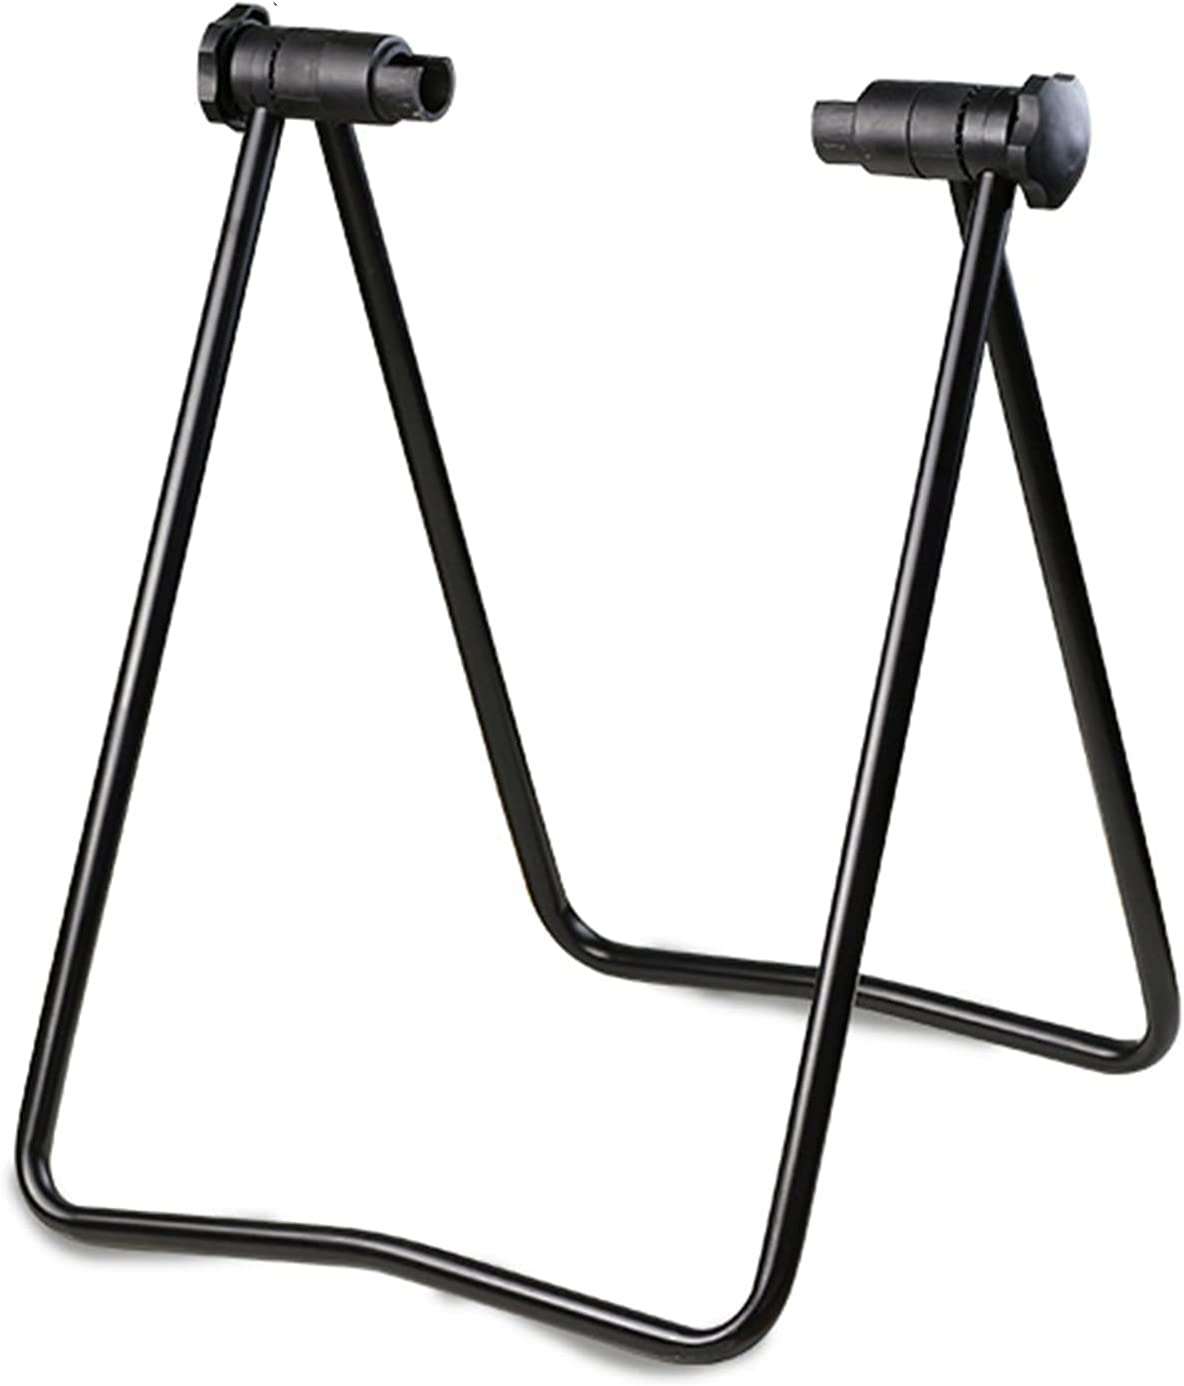 NAOTA Home Repair Stand Sale price Max 67% OFF ,Portable Bicycle Mechanics Worksta